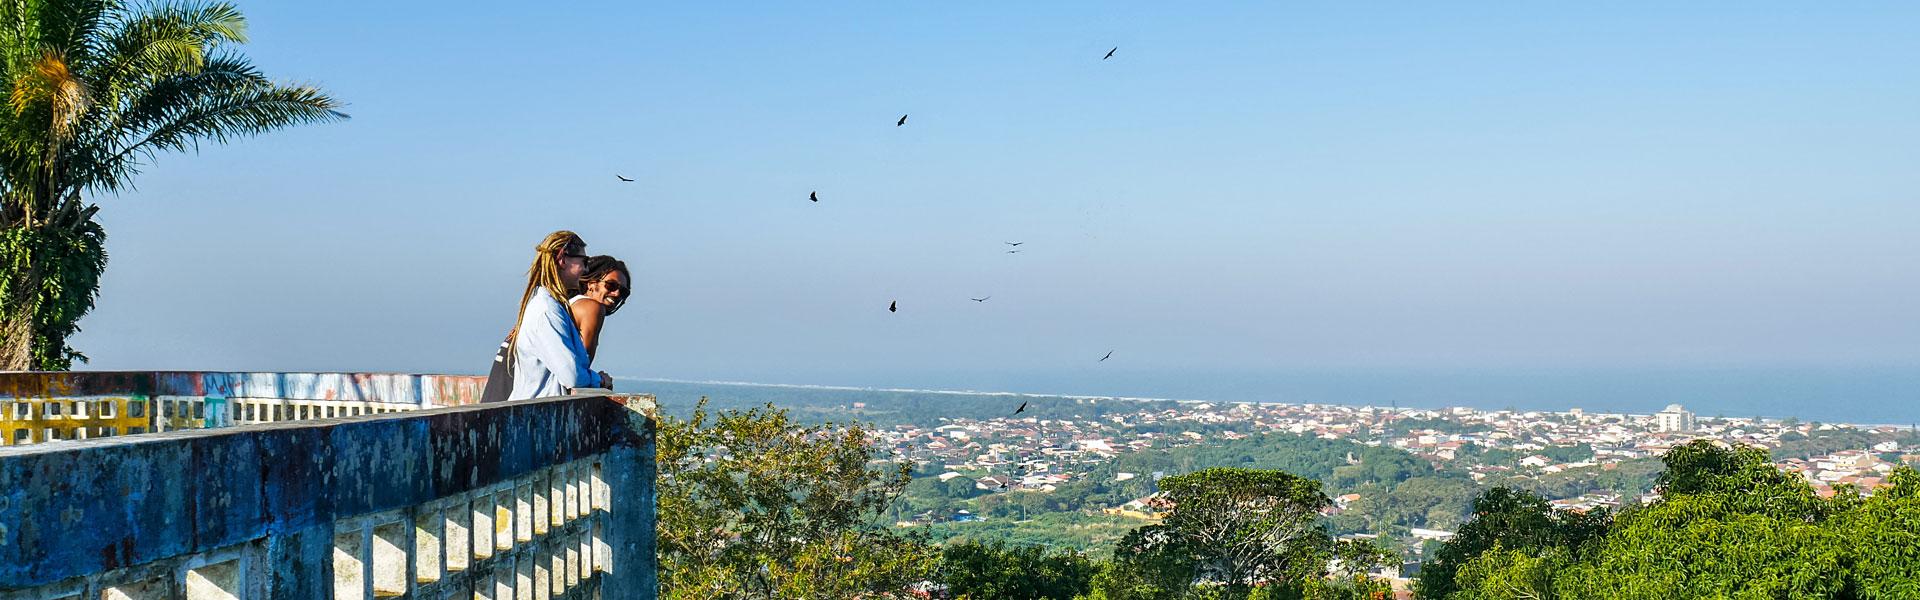 Rasta couple overlooking Peruíbe, Brazil, from Mirante da Torre